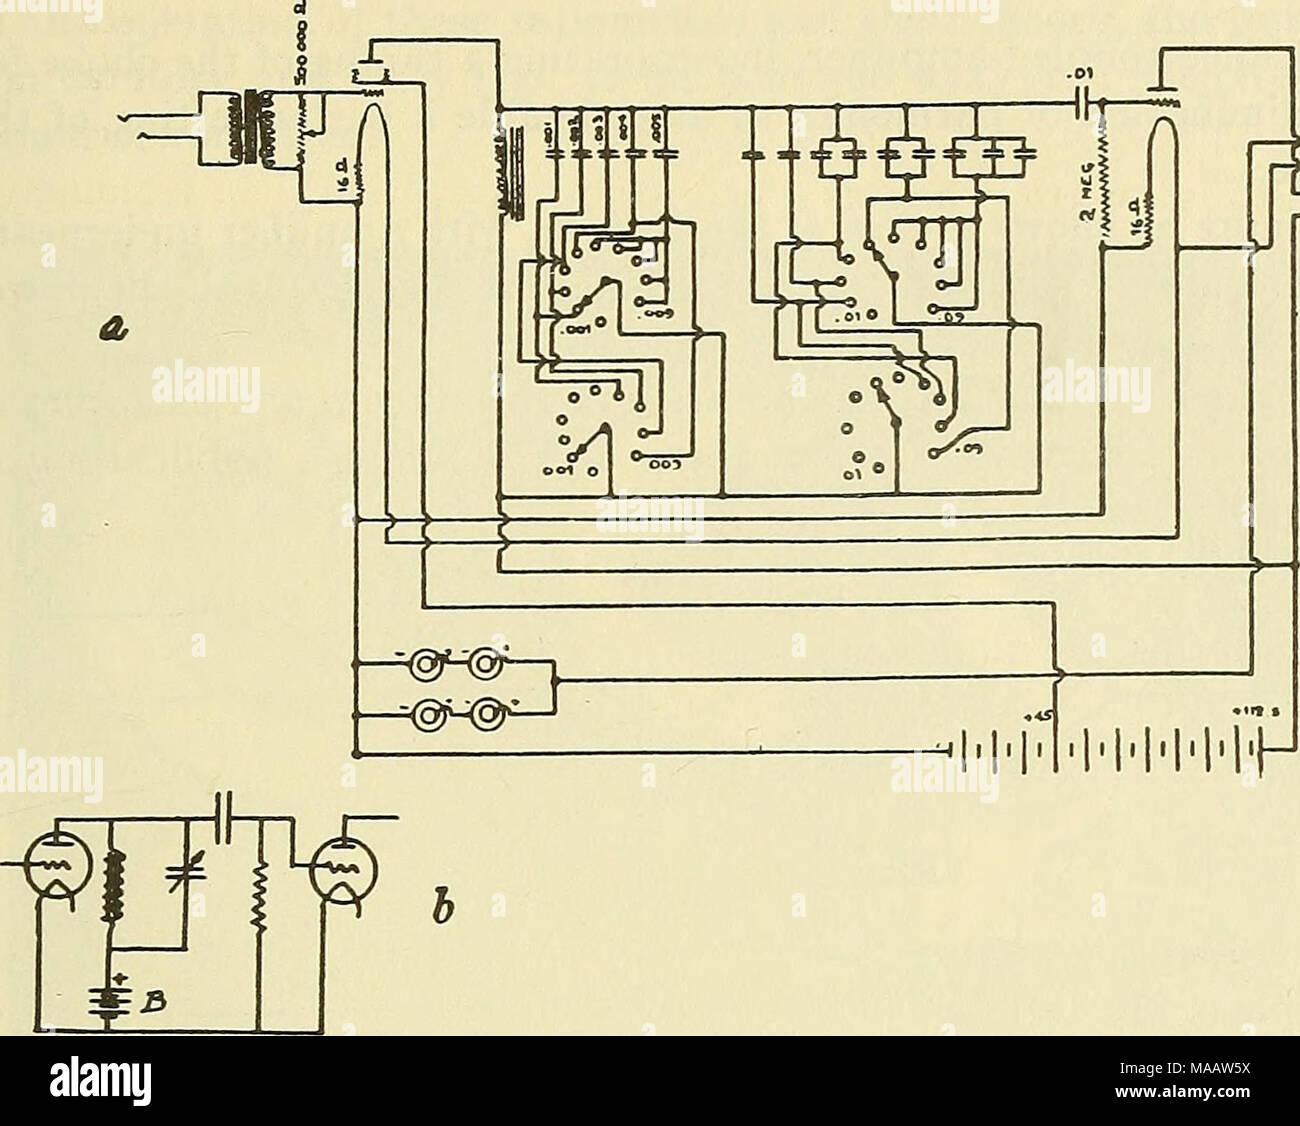 Wiring Diagram Stockfotos & Wiring Diagram Bilder - Alamy